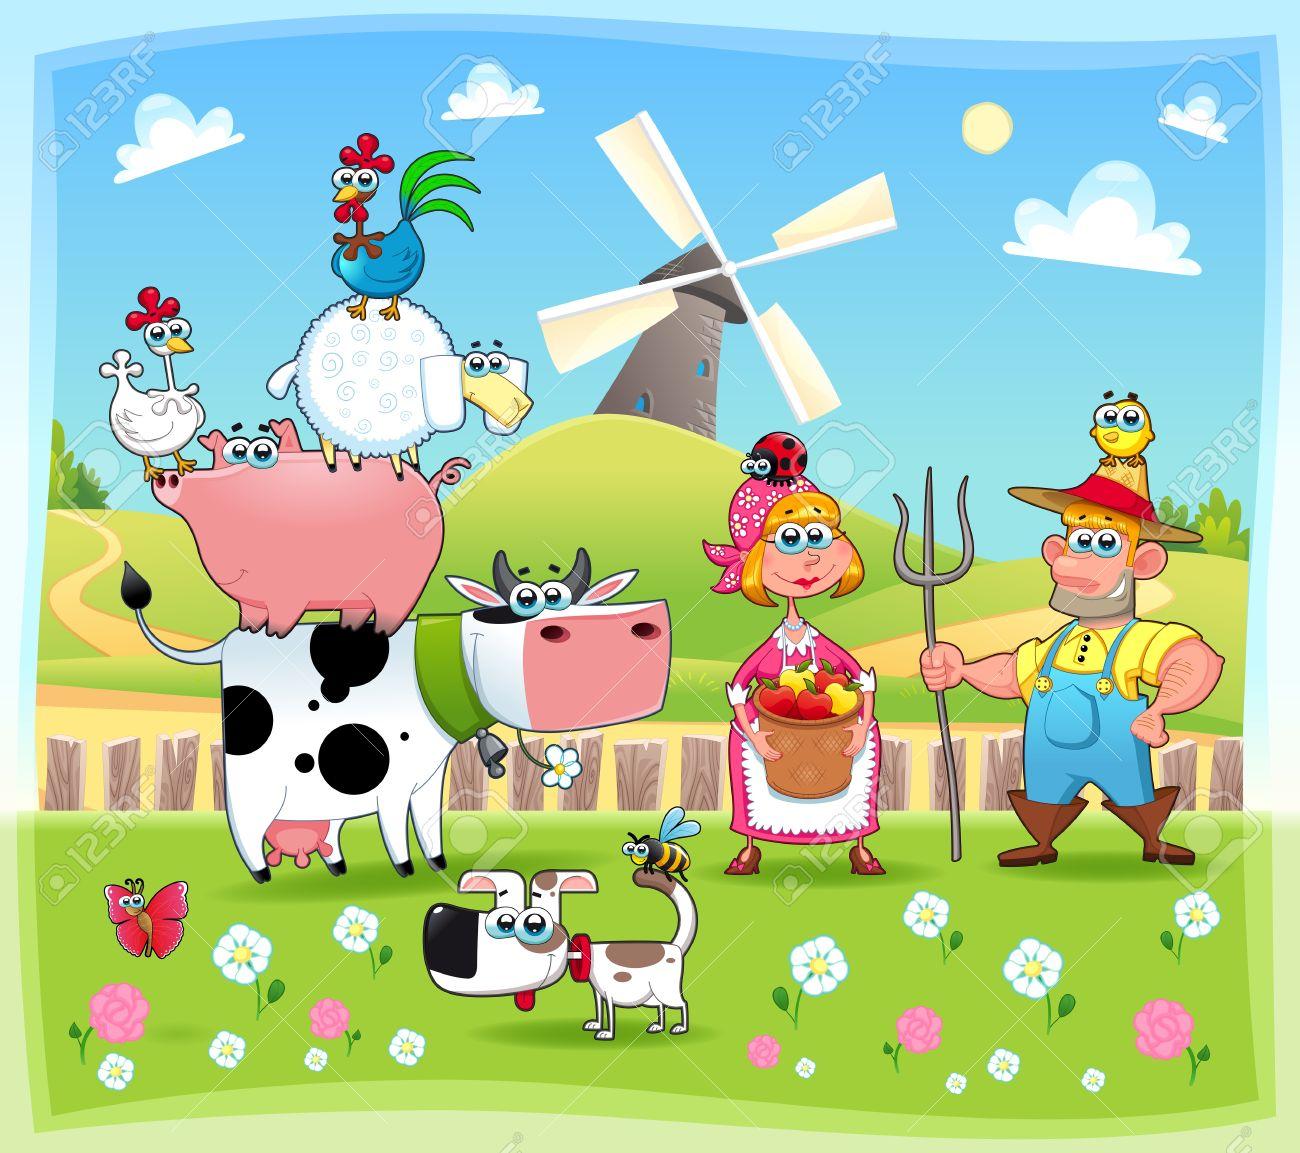 Funny farm family. Cartoon and vector illustration. Stock Vector - 15047138